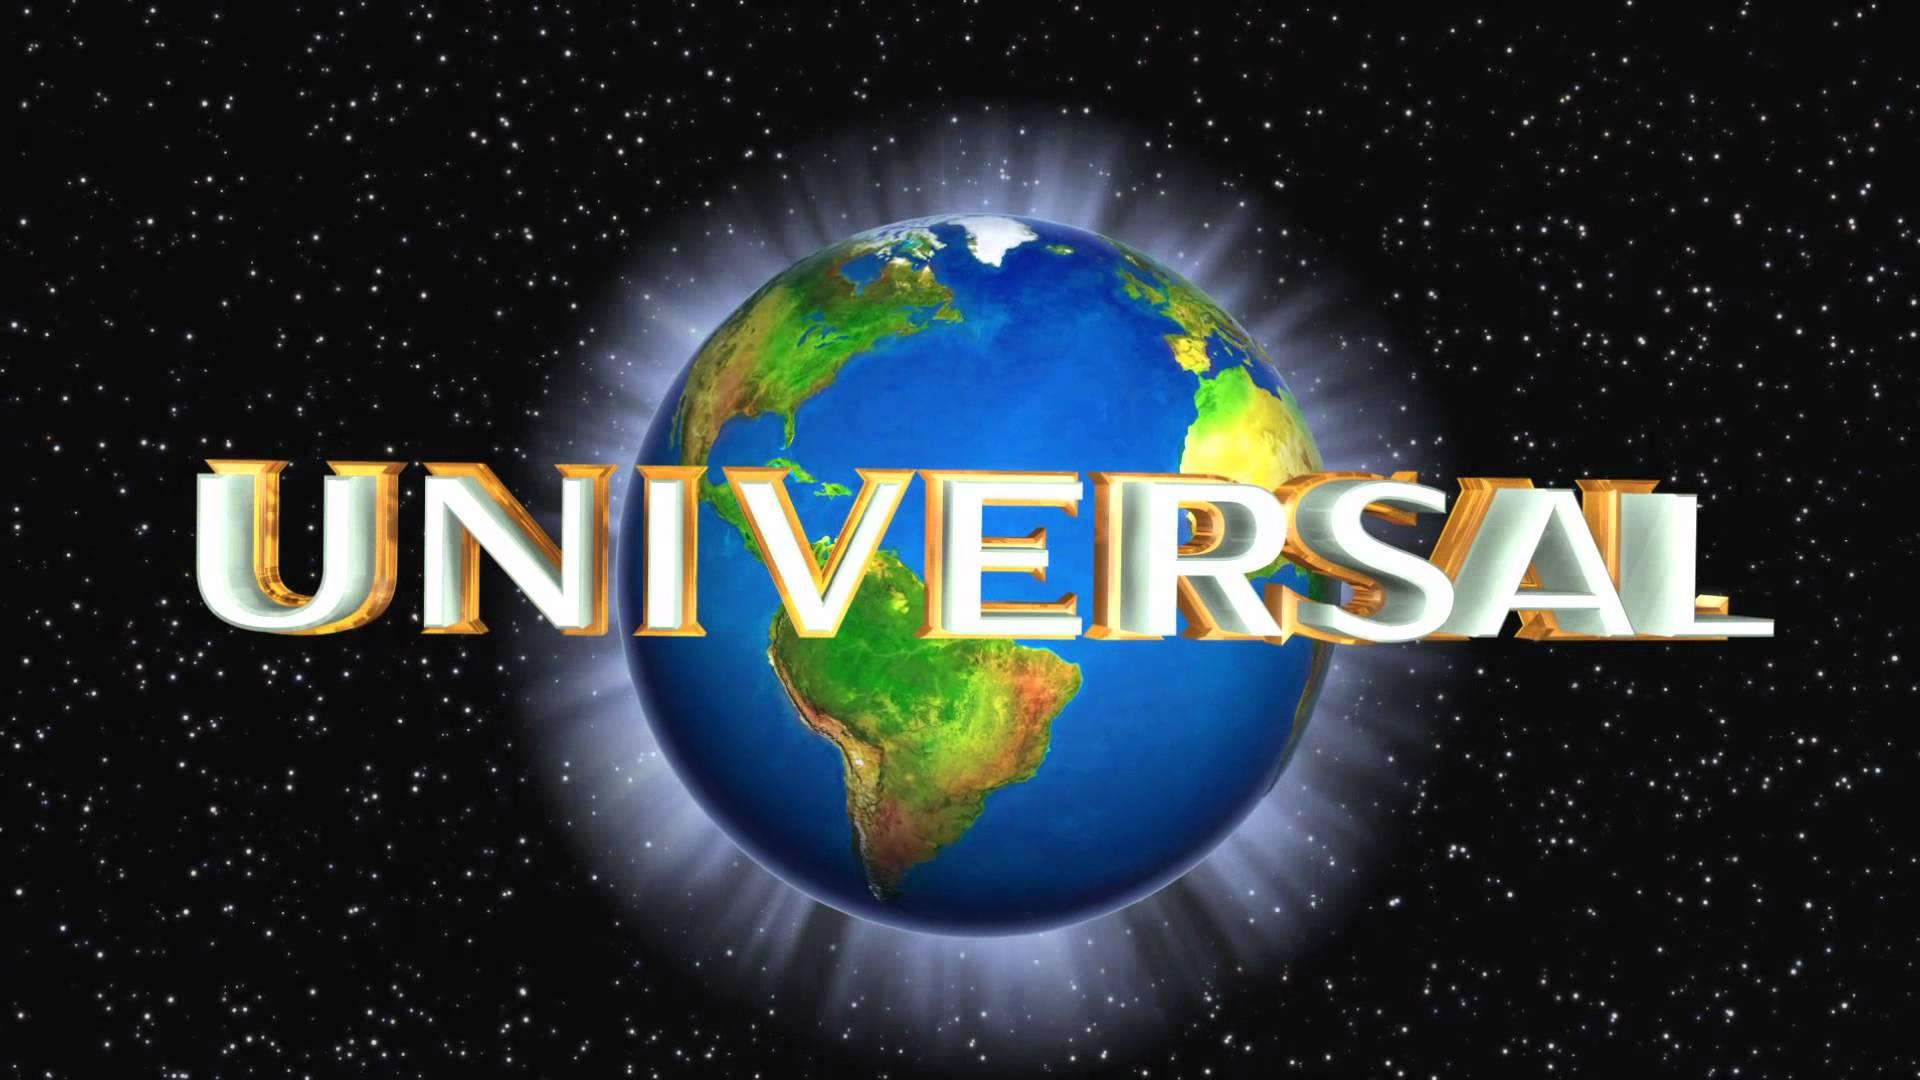 Universal distribuirà online (VOD) i propri film in uscita thumbnail